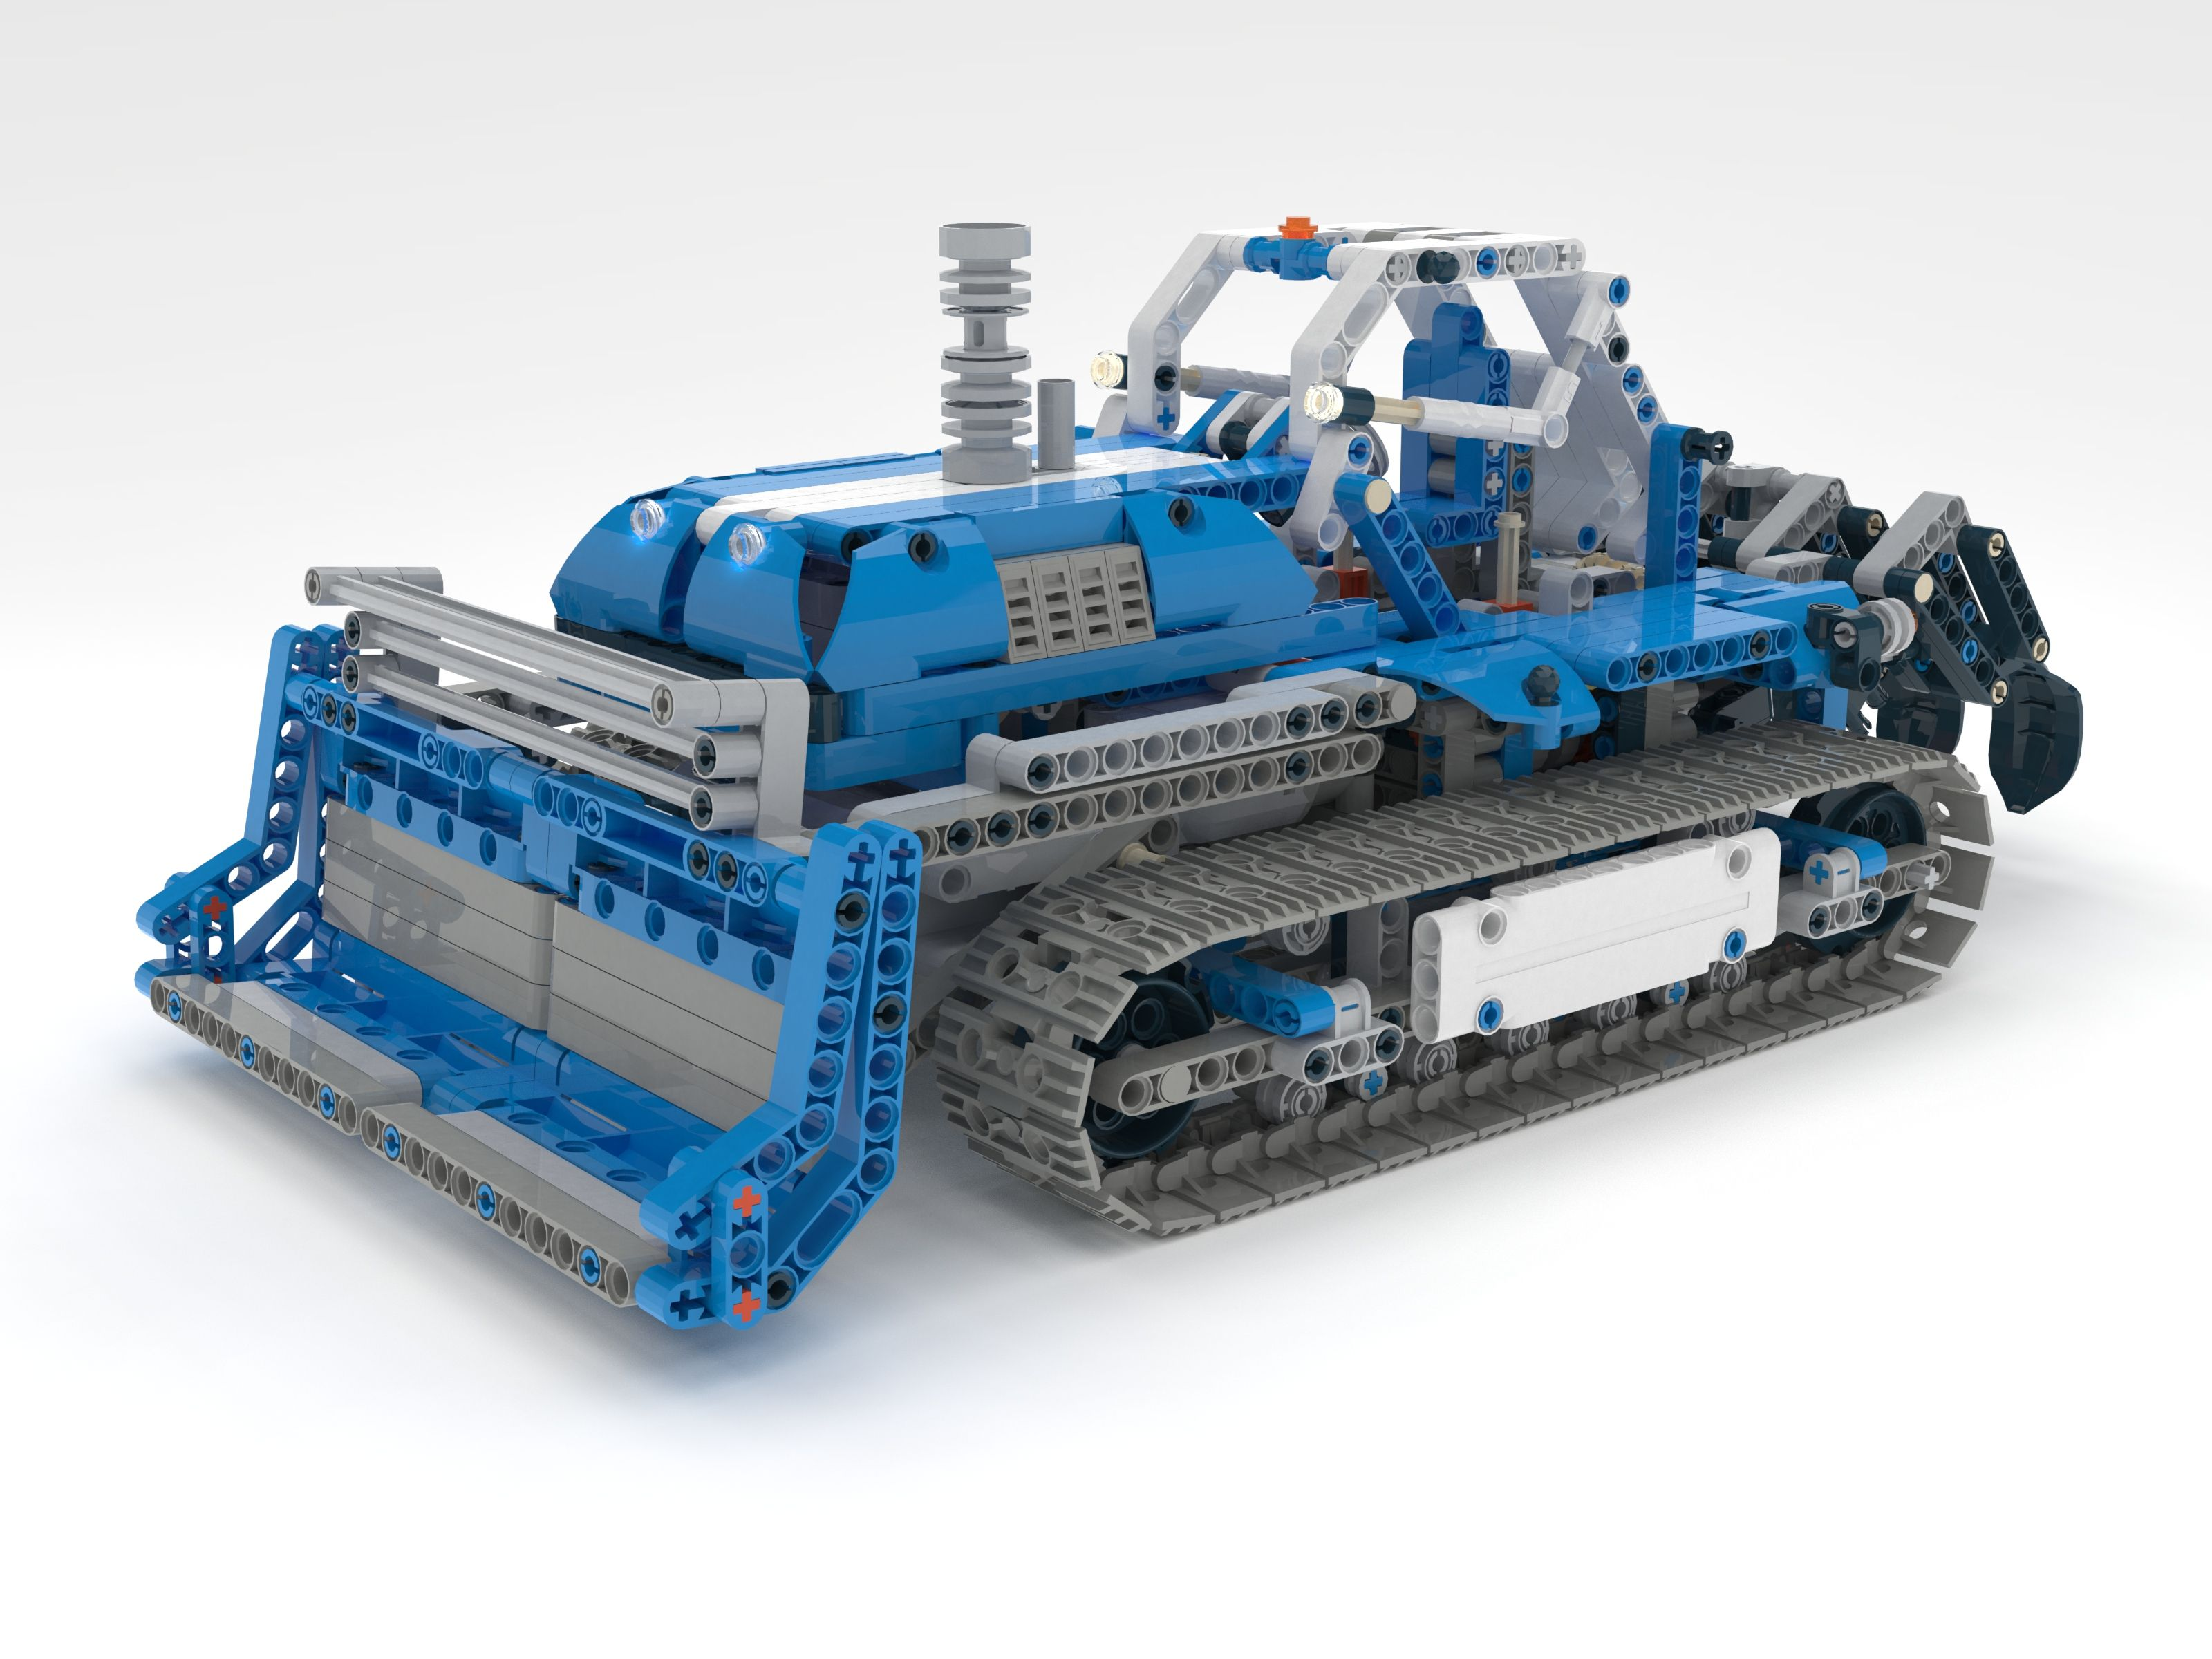 Bulldozer 42042 Alternative Model Lego Pinterest Lego Moc And Lego